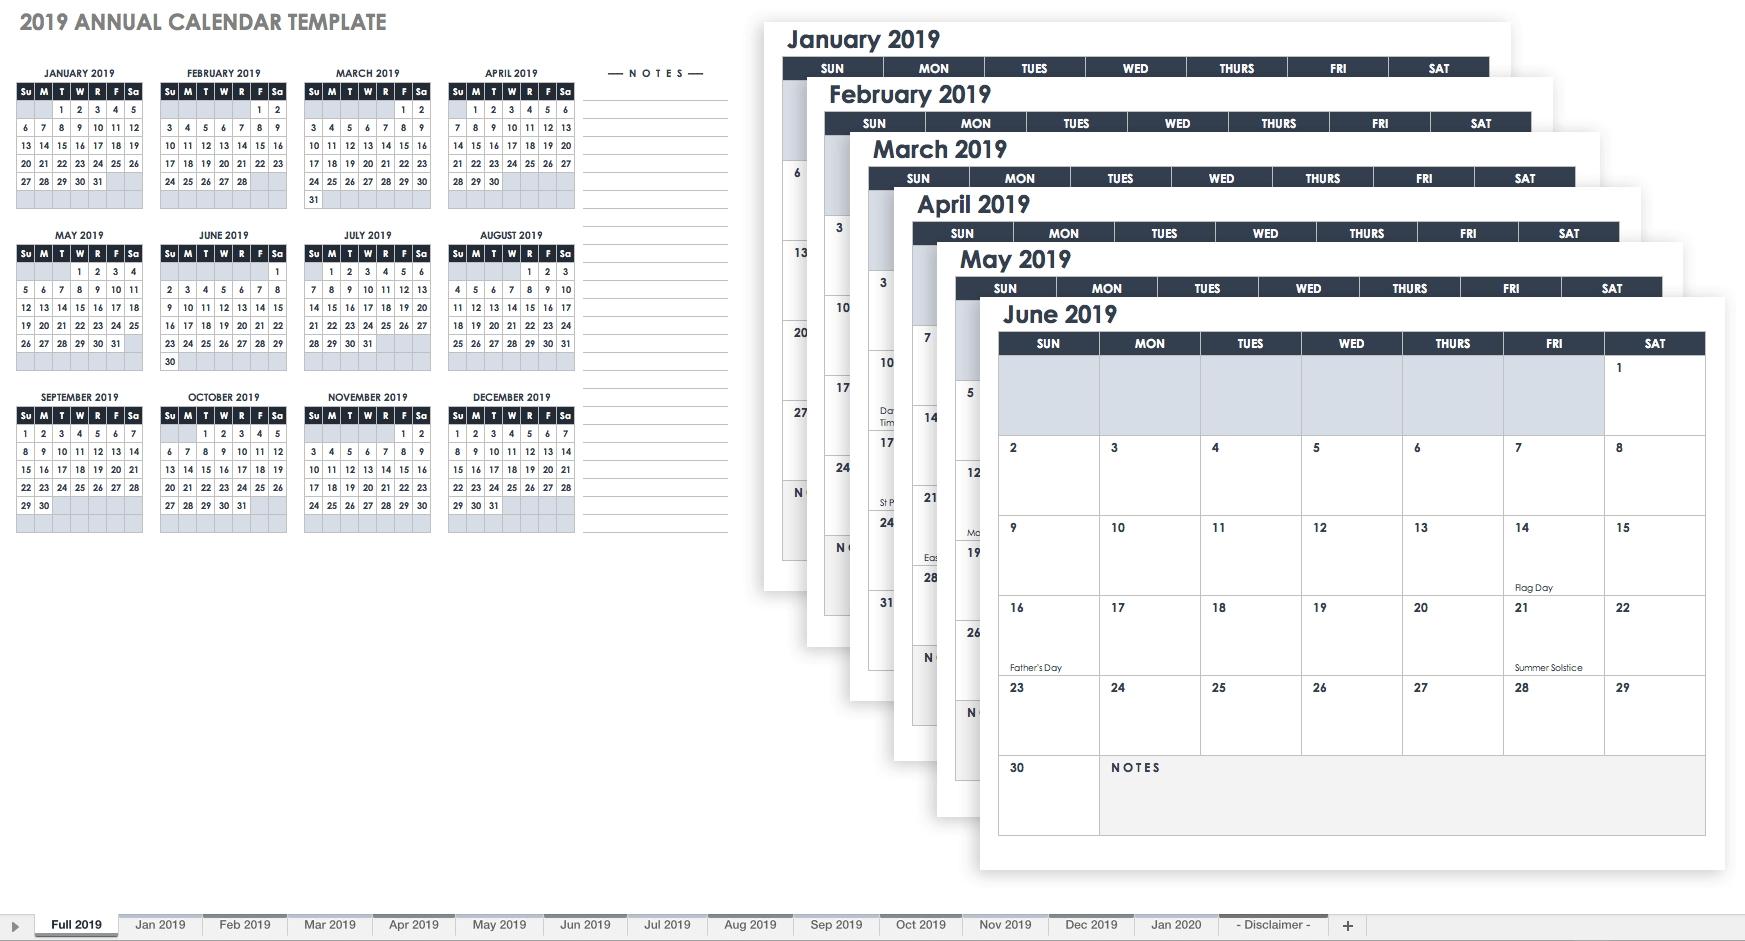 15 Free Monthly Calendar Templates   Smartsheet regarding Blank Calendar Mon Through Fri With No Dates Or Month